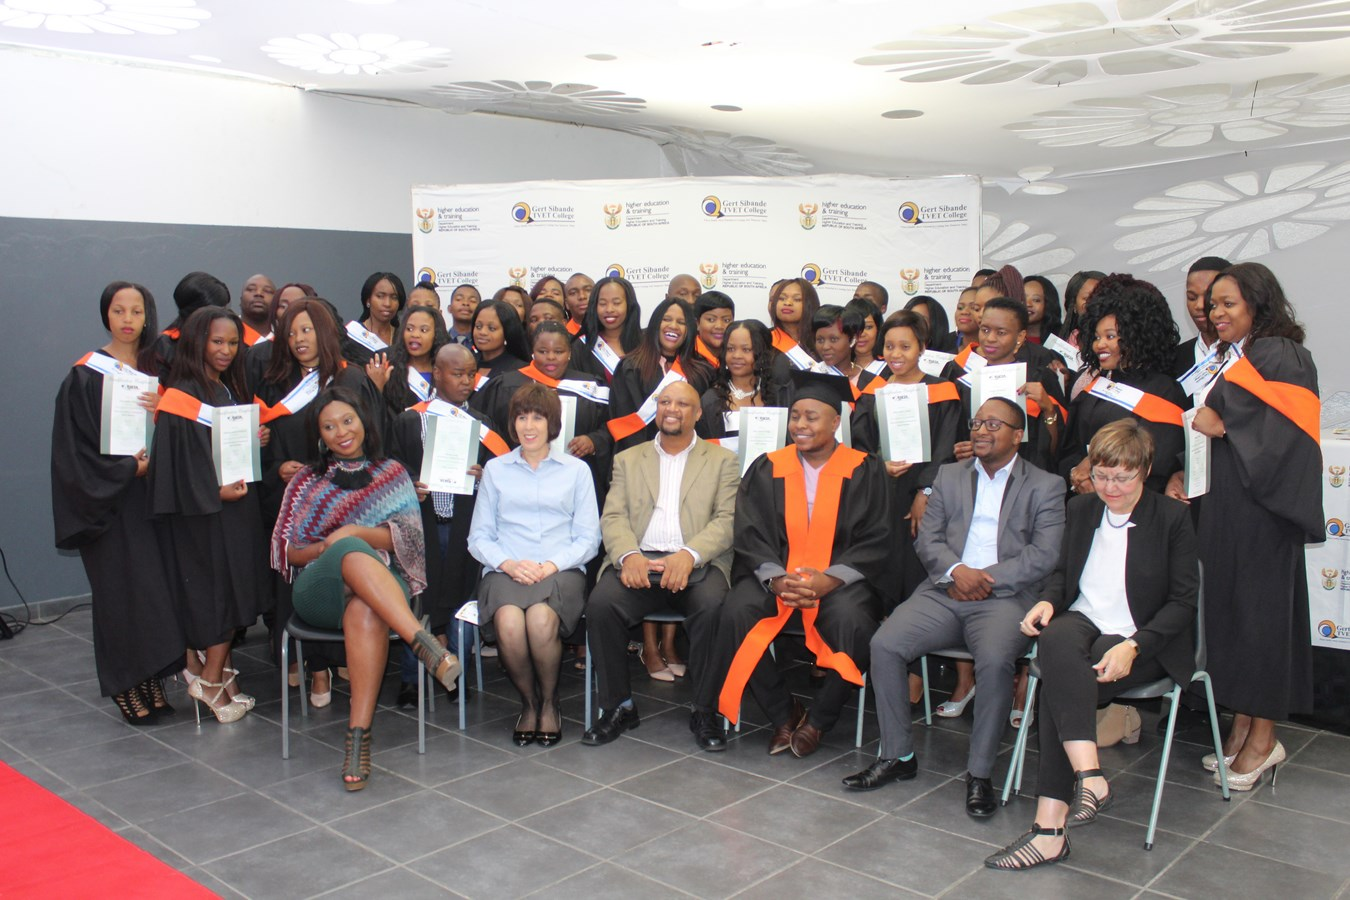 Graduates of Gert Sibande College